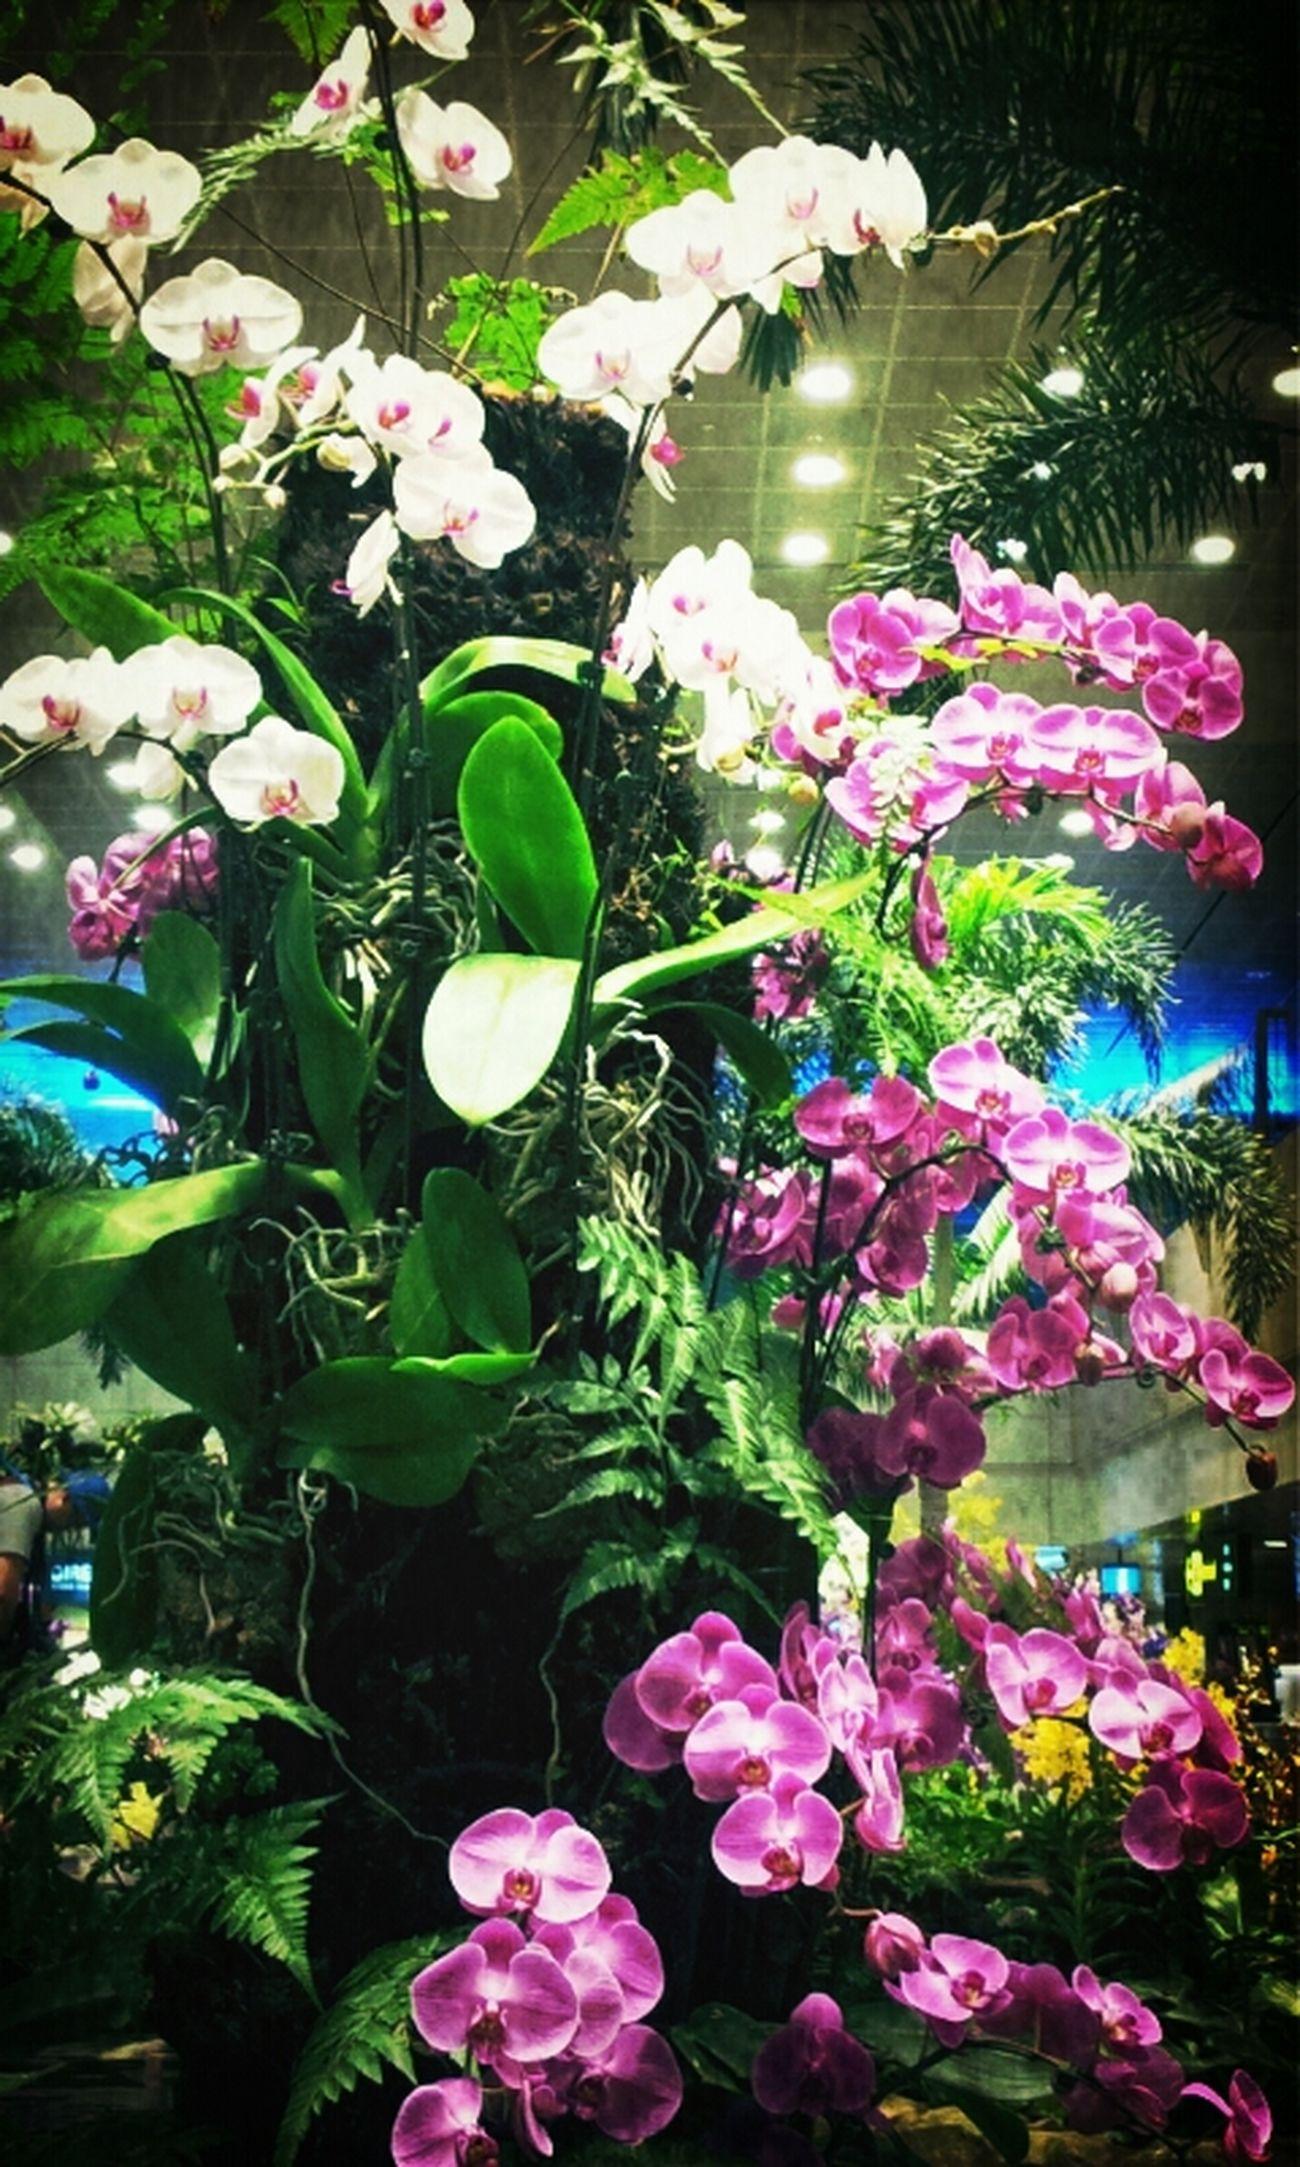 Flowers Nature Orchids #flower#garden#nature#ecuador#santodomingoecuador#eyeEmfollowers#iphoneonly#nofiltrer#macro_garden#pretty#beautiful#followme#sho